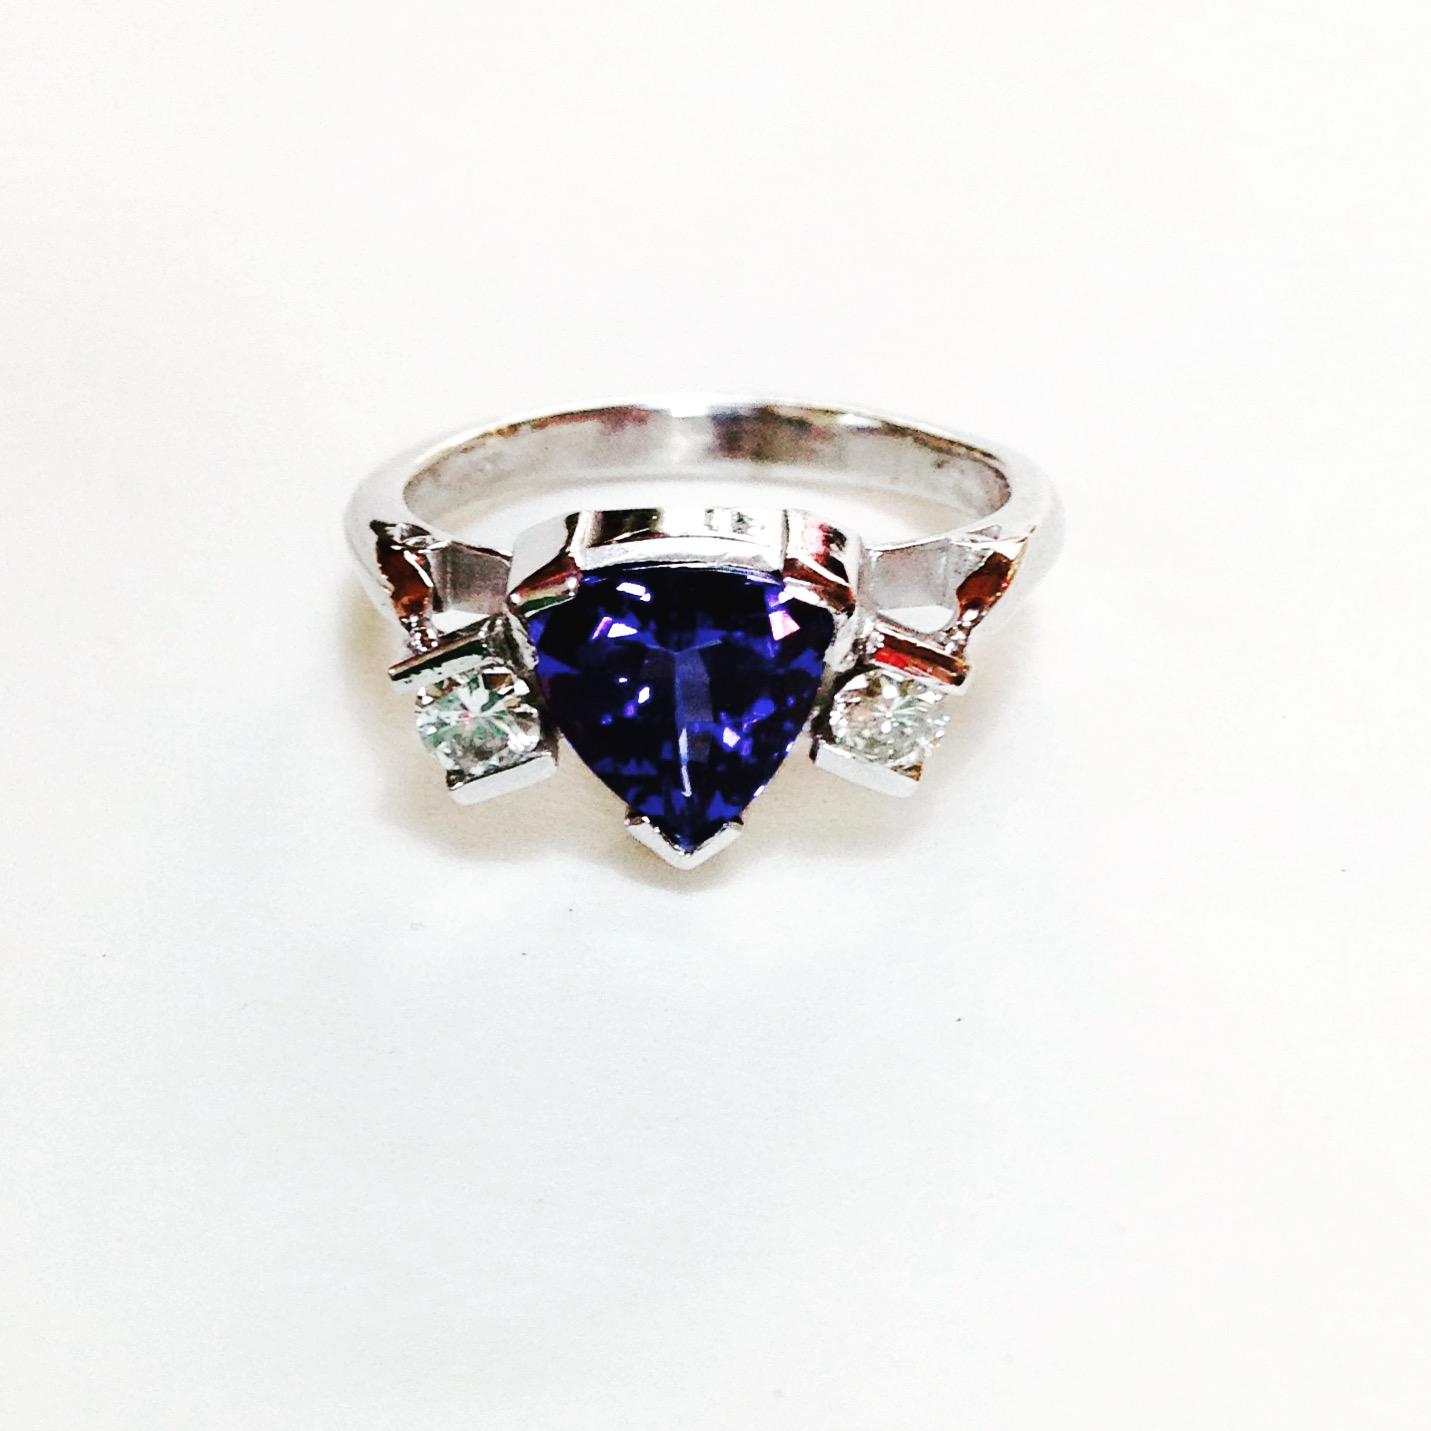 Colette Hazelwood Contemporary Jewellery Trillion tanzanite and Diamonds Ring 18ct White Gold